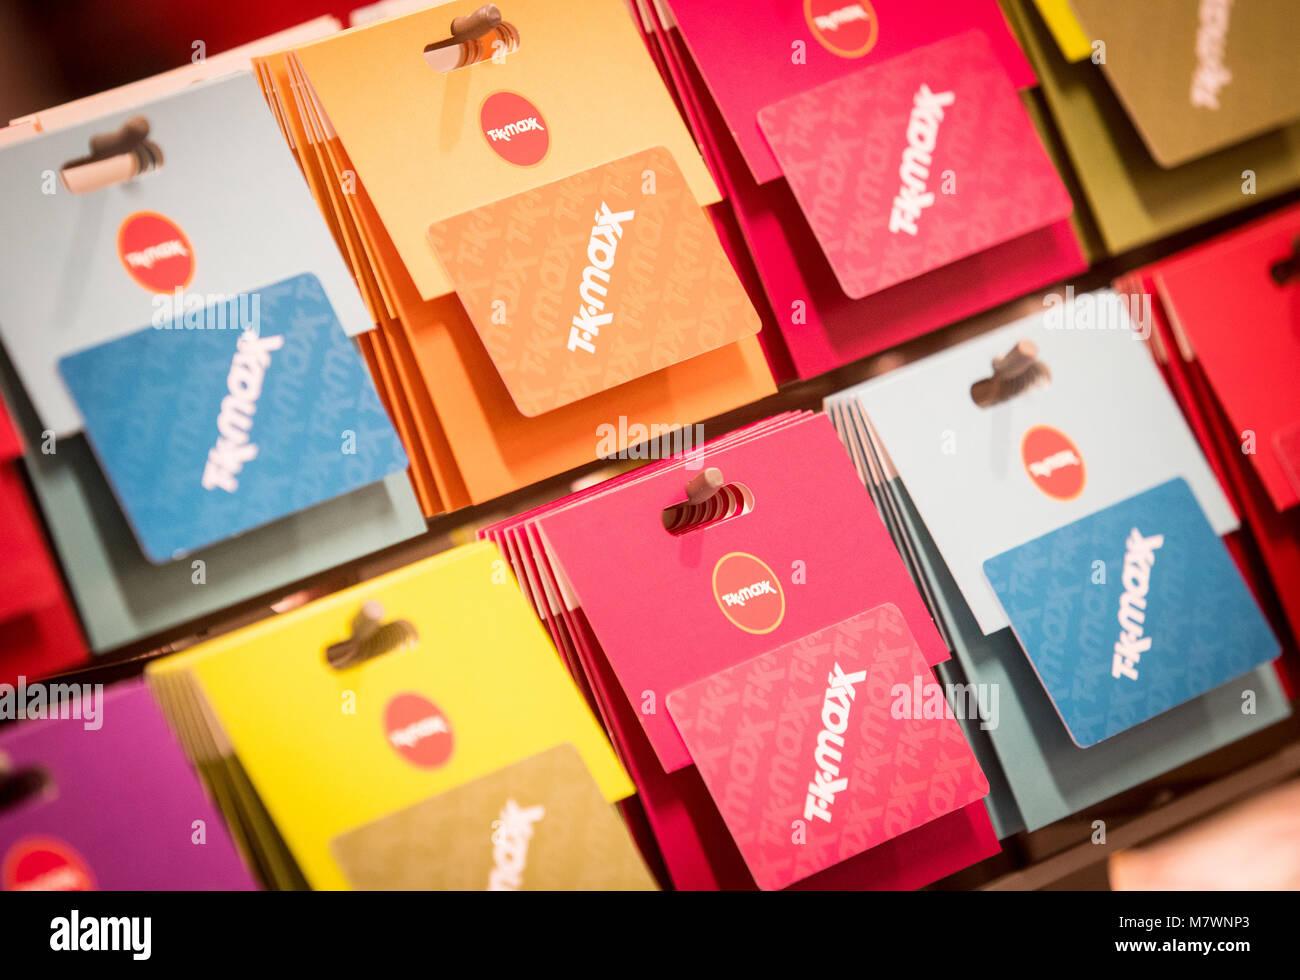 Gift Cards Stockfotos & Gift Cards Bilder - Alamy